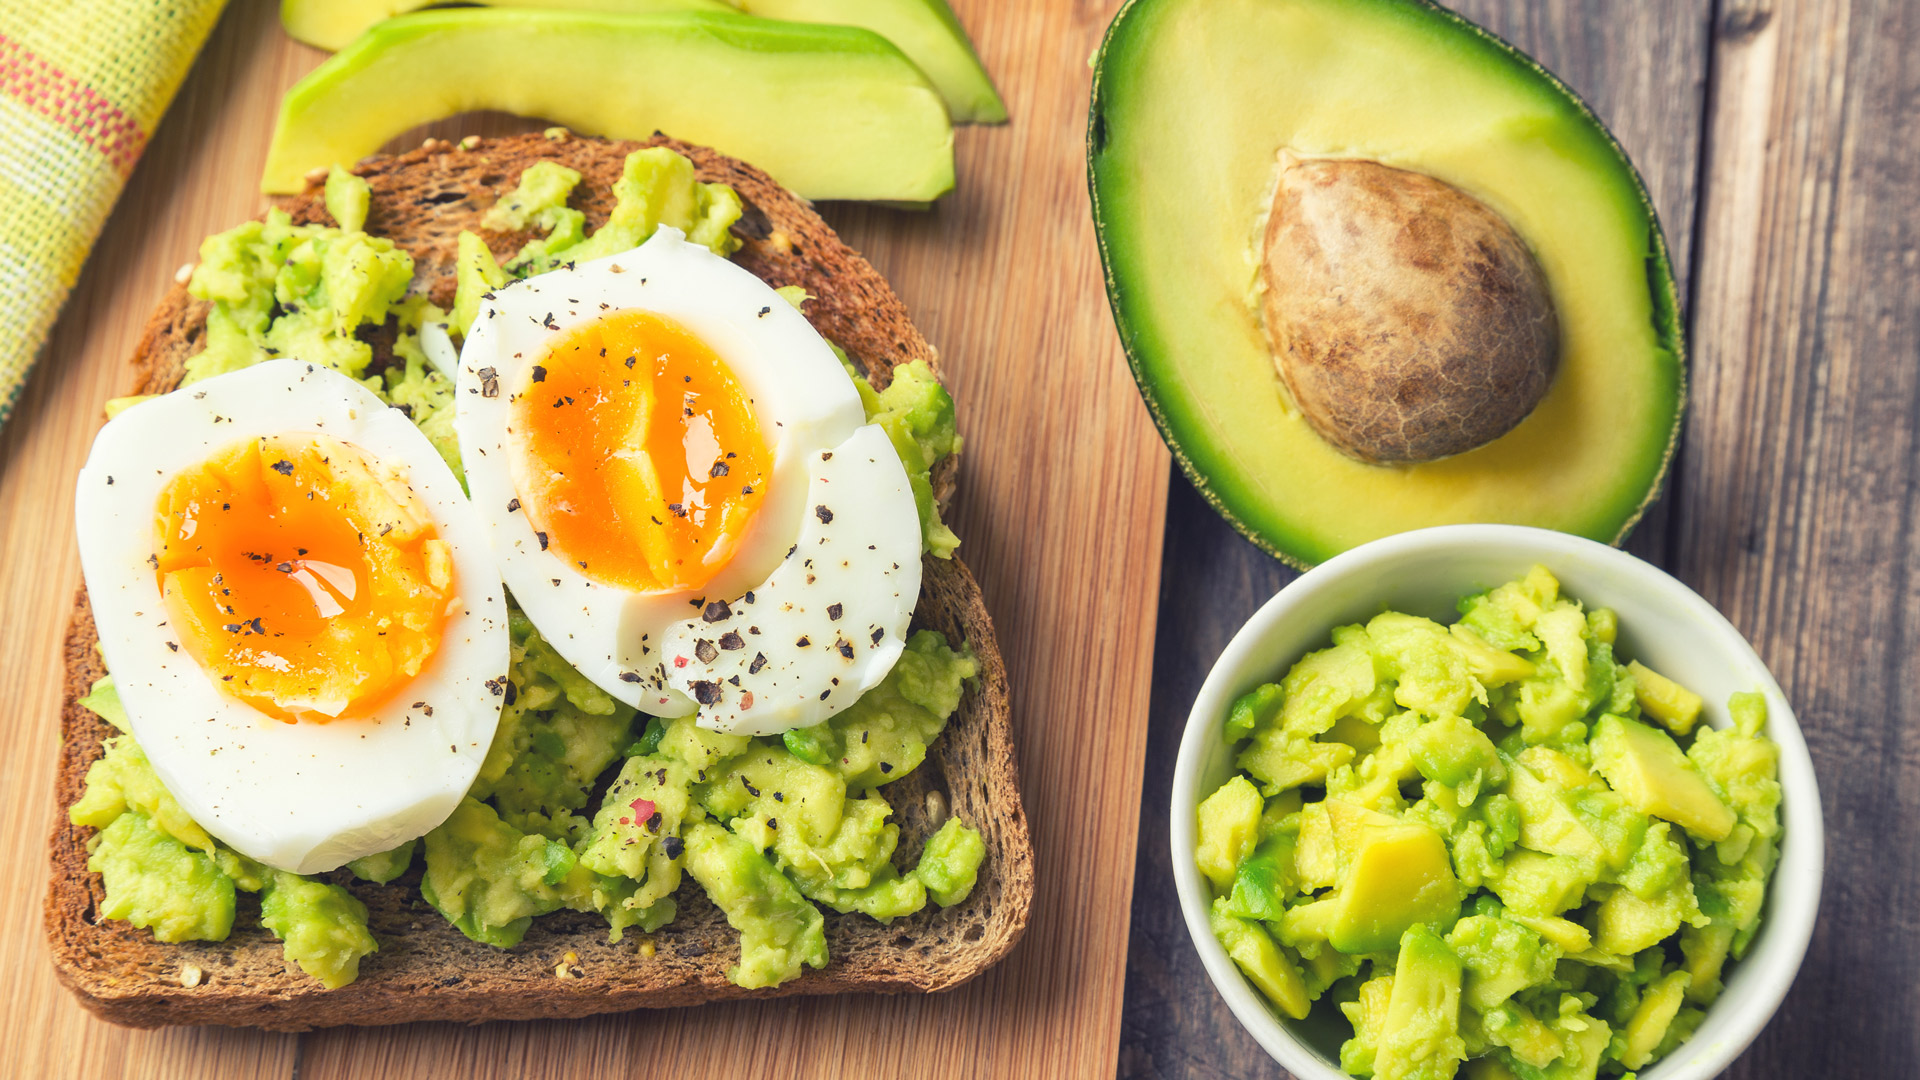 Рецепт полезного завтрака 7